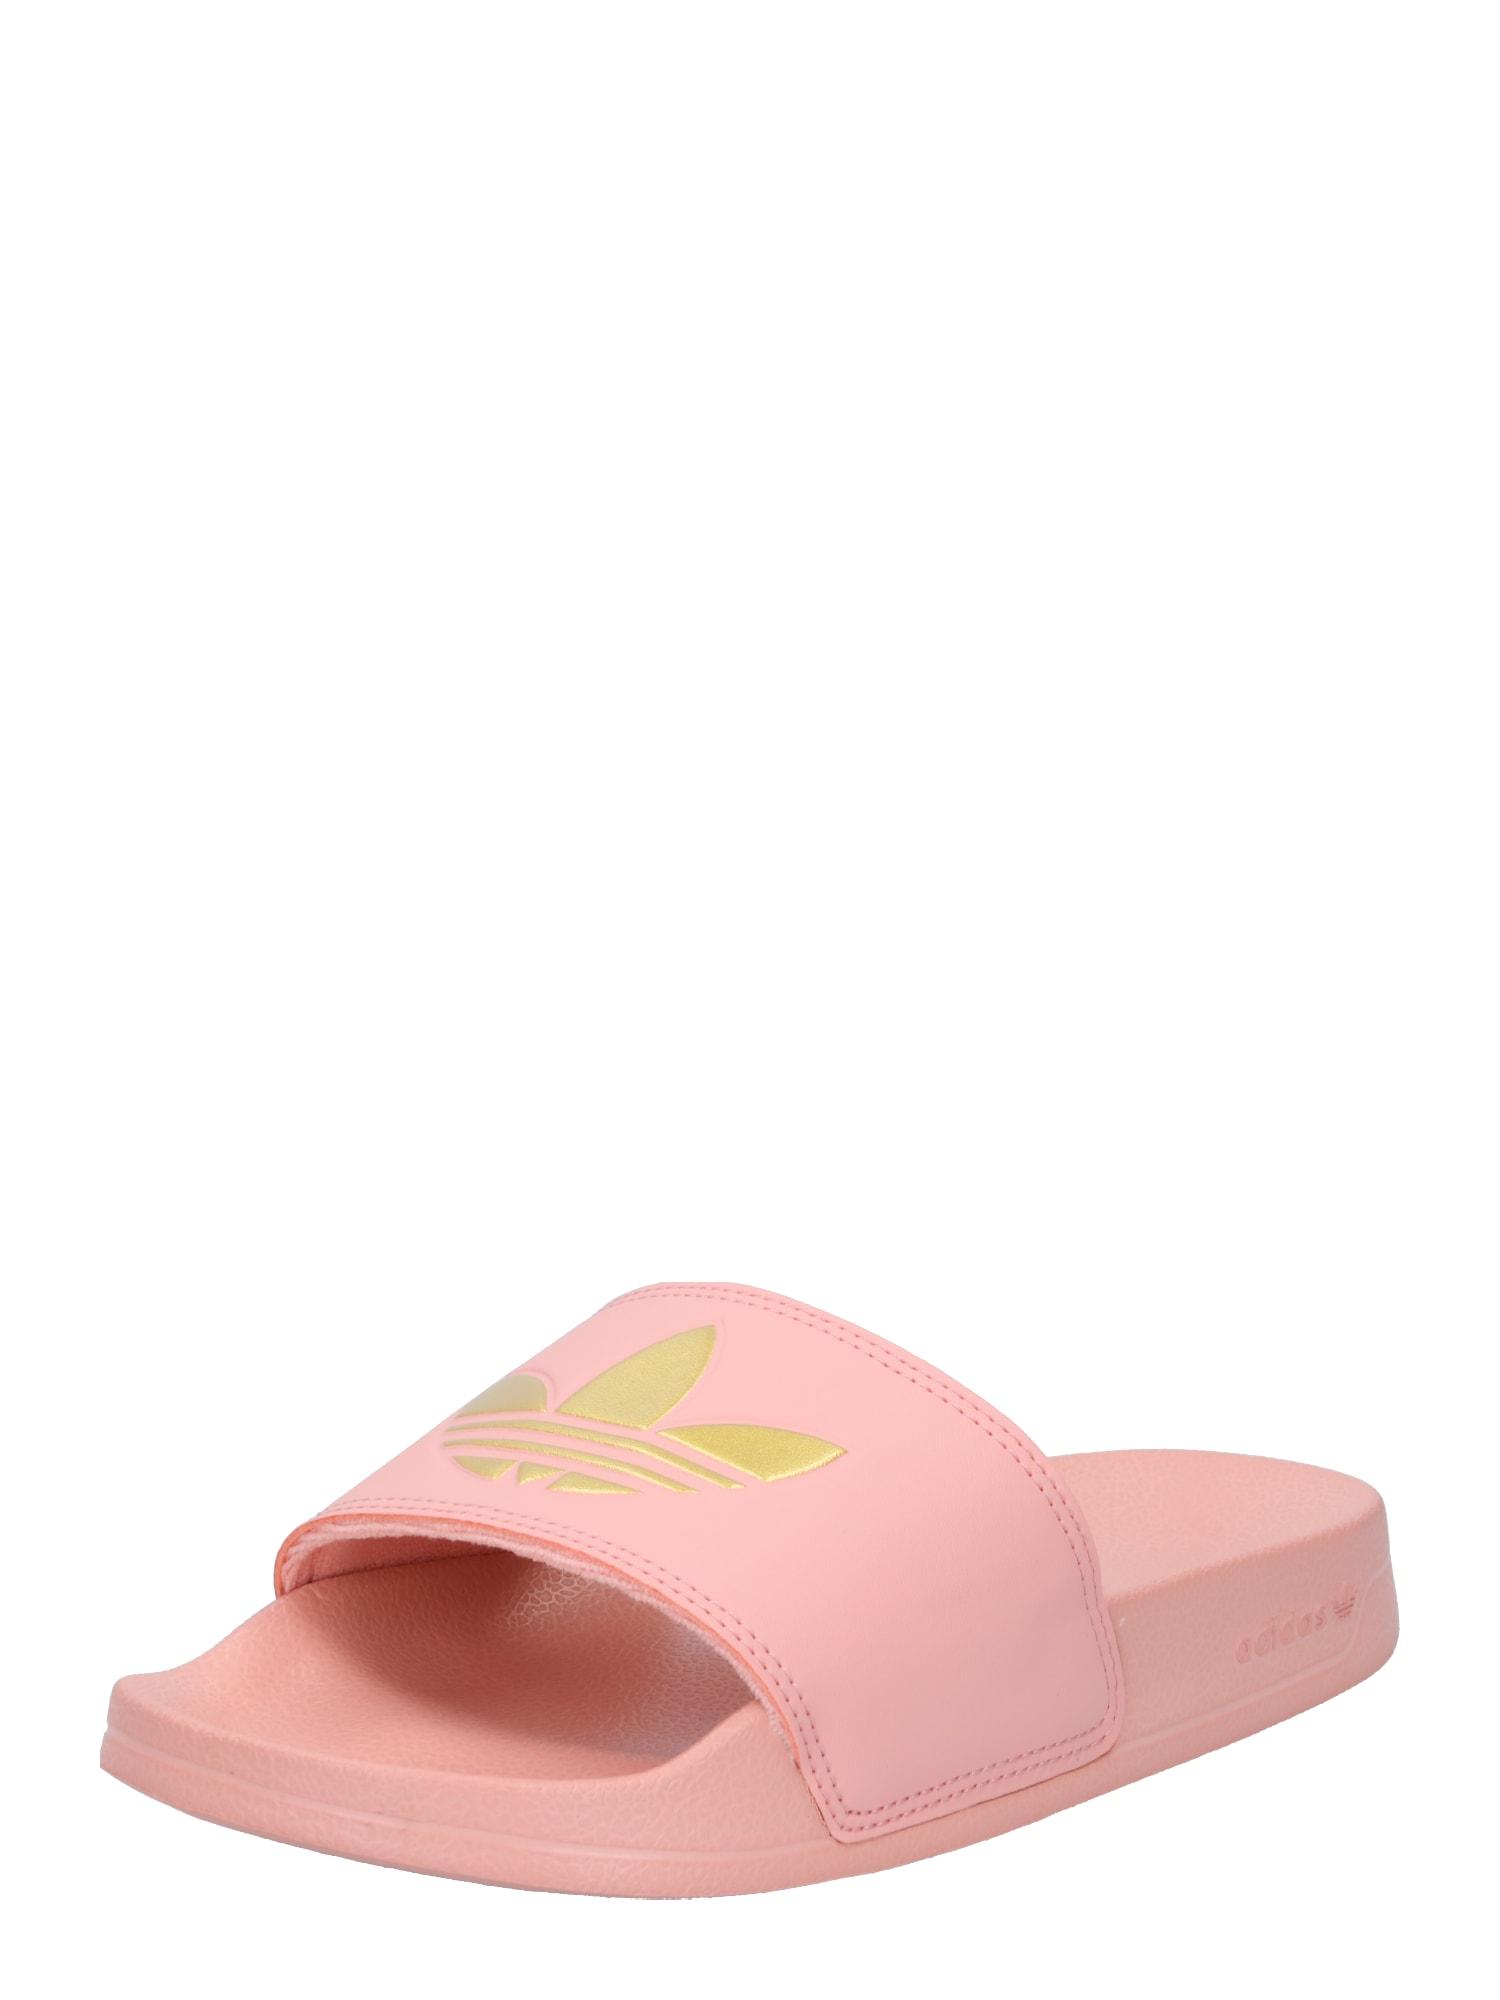 ADIDAS ORIGINALS Pantofle  starorůžová / zlatá